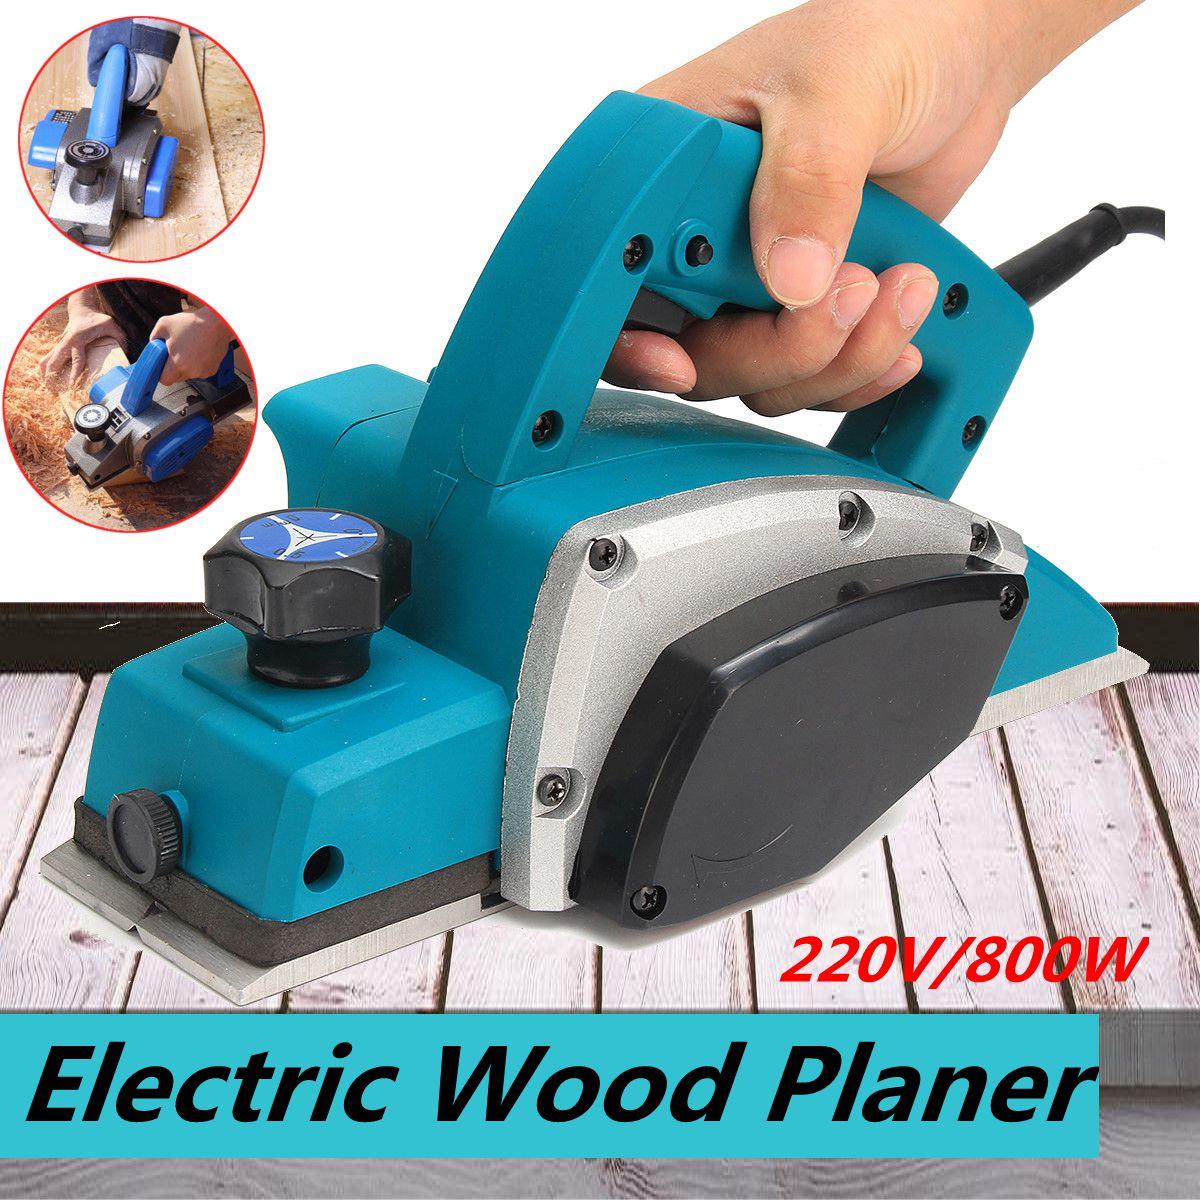 Electric Wood Planer Door Plane Hand Held Woodworking Power Surface Machine 110V